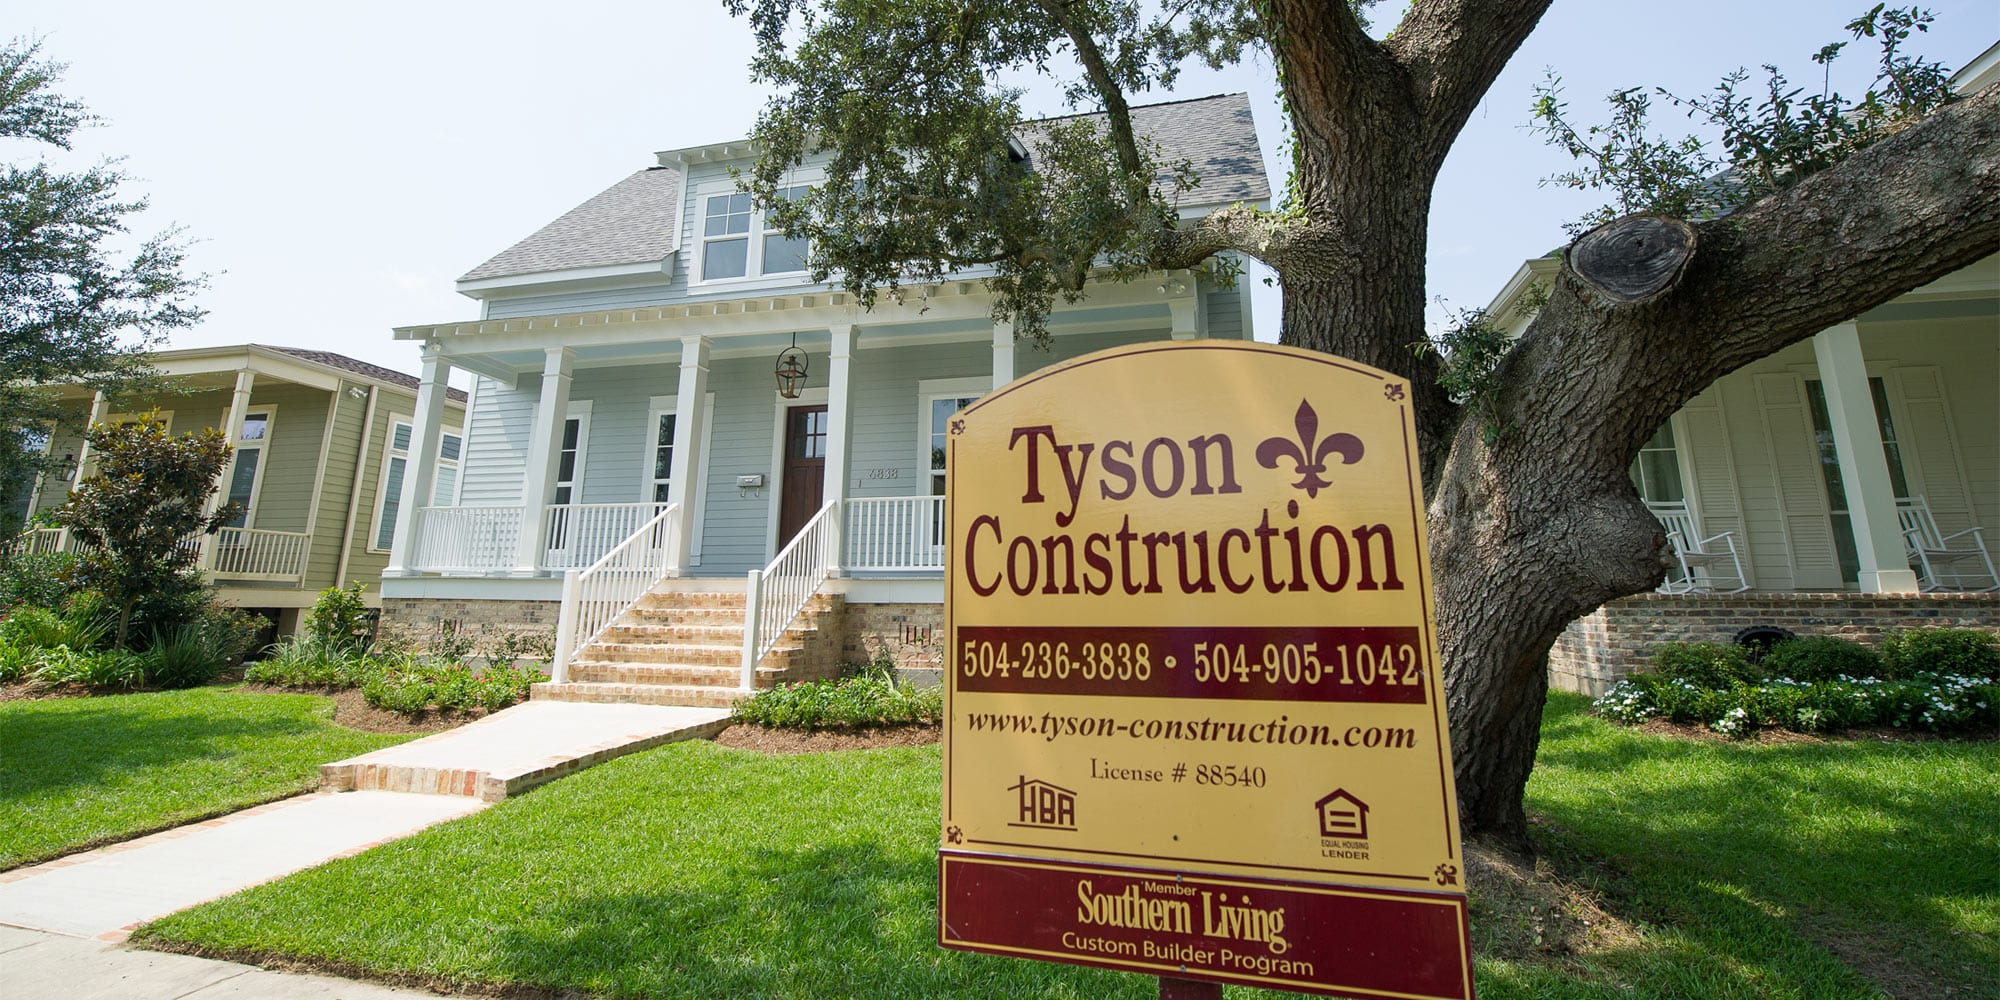 Contact Tyson Construction